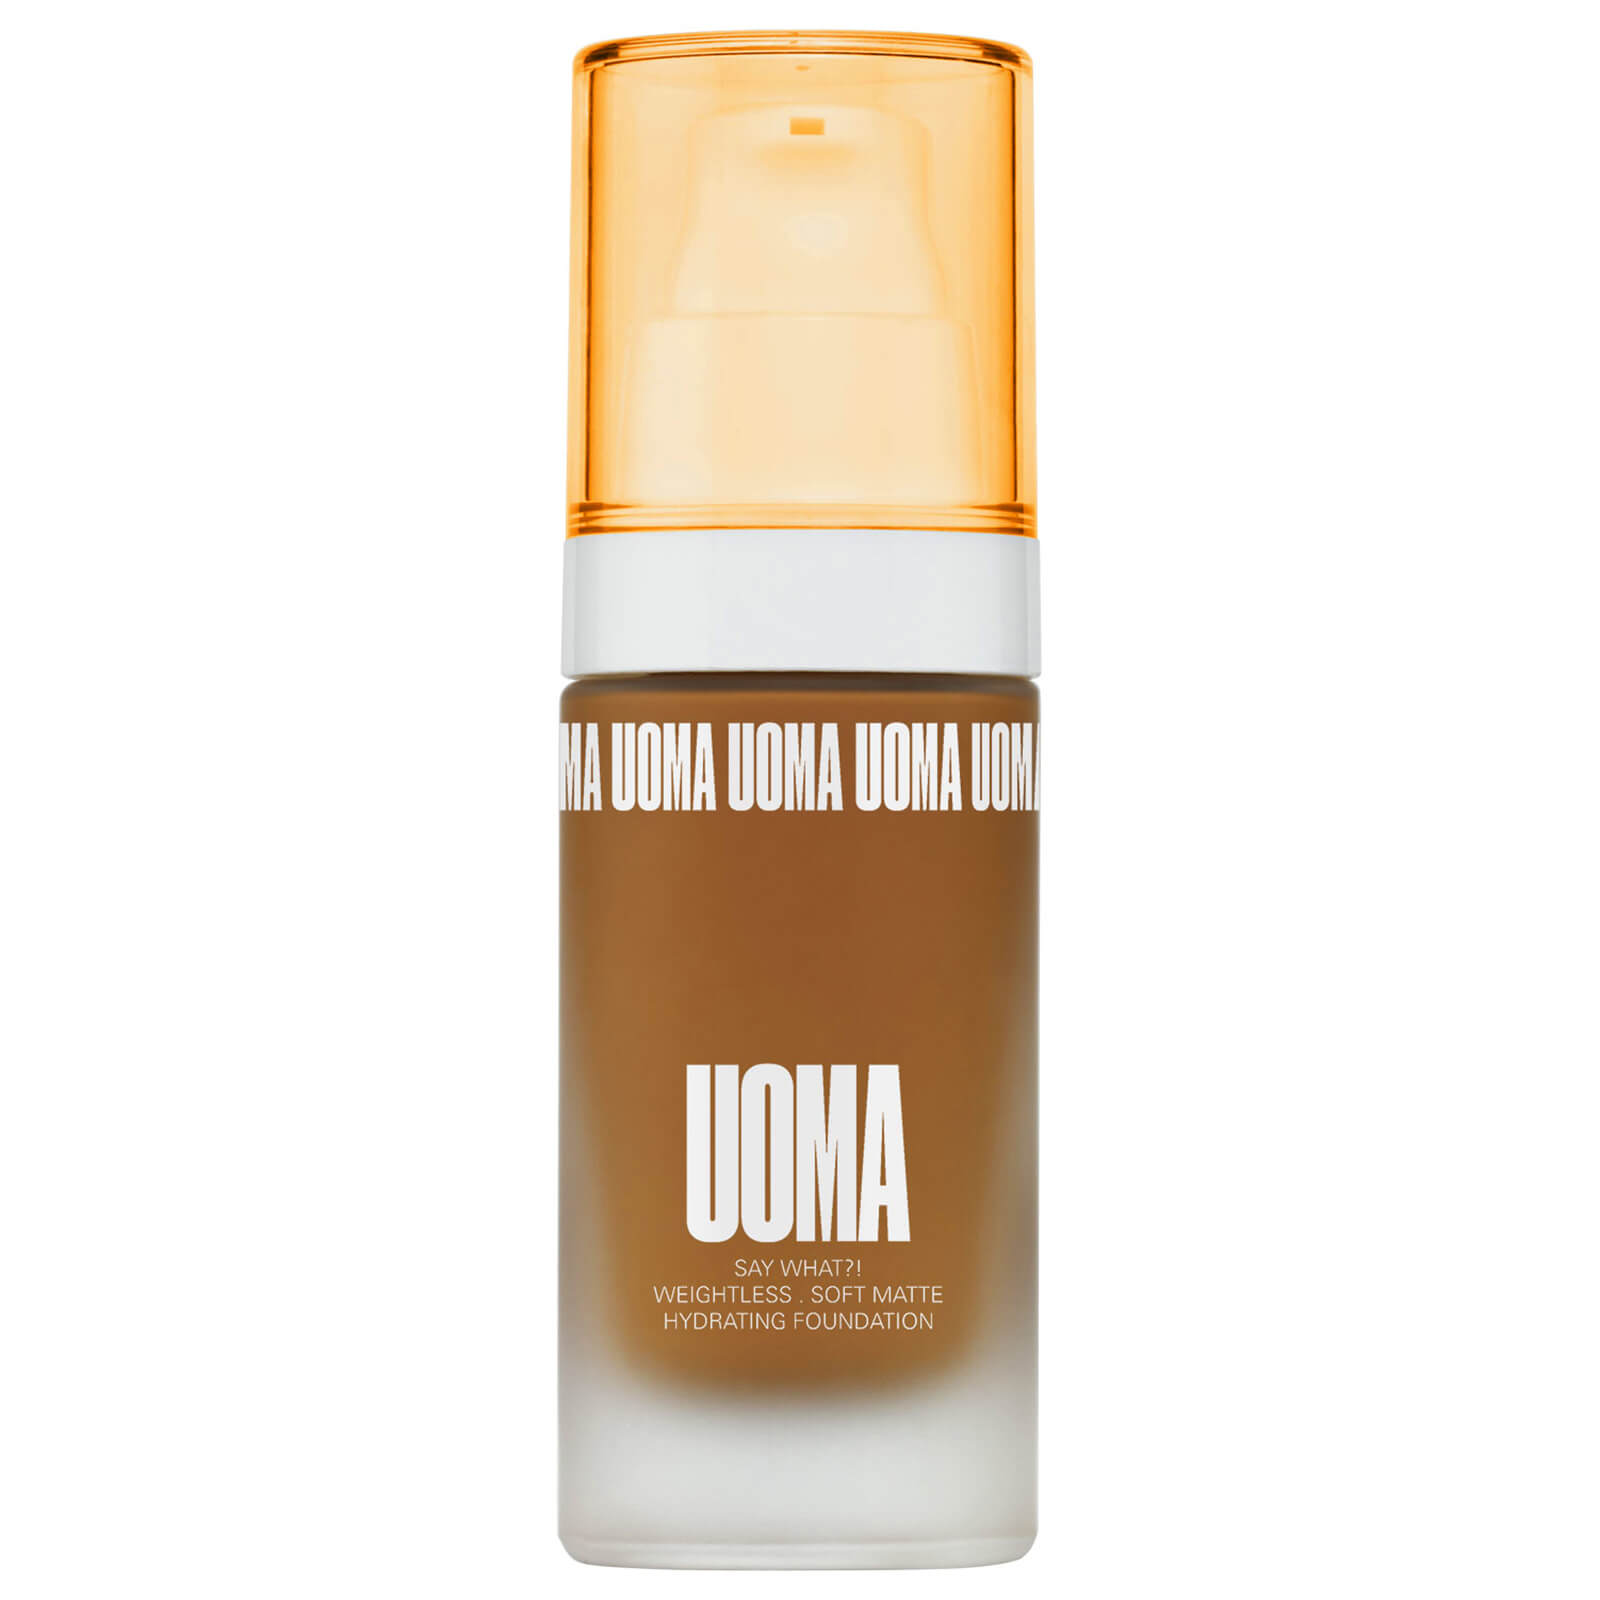 UOMA Beauty Say What Foundation 30ml (Various Shades) - Brown Sugar T2N